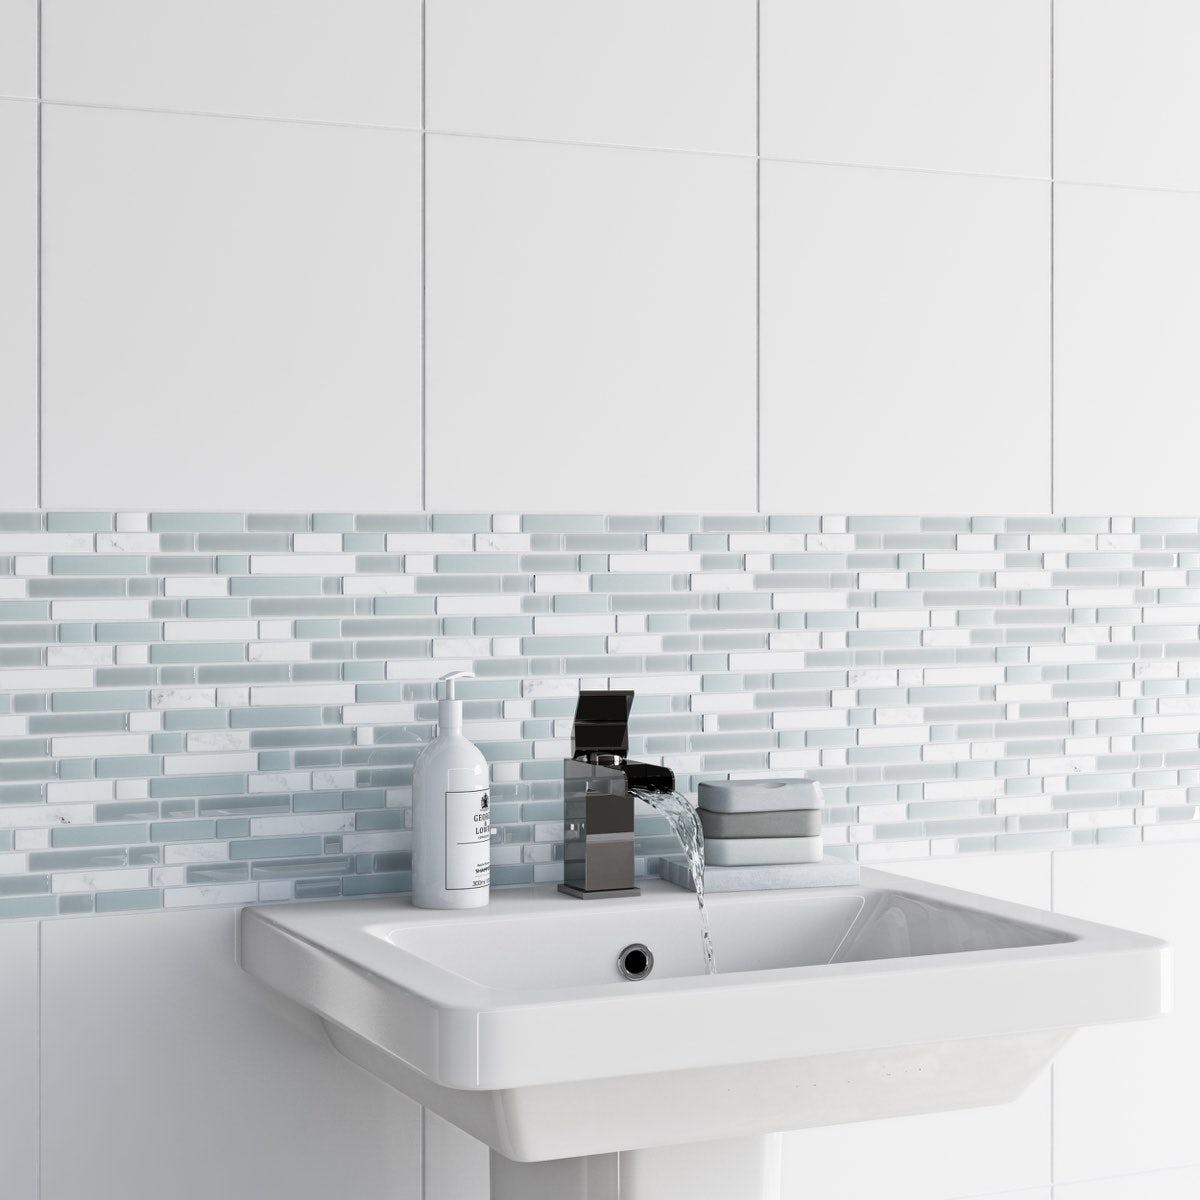 British Ceramic Tile Mosaic ice white gloss tile 305mm x 305mm - 1 sheet